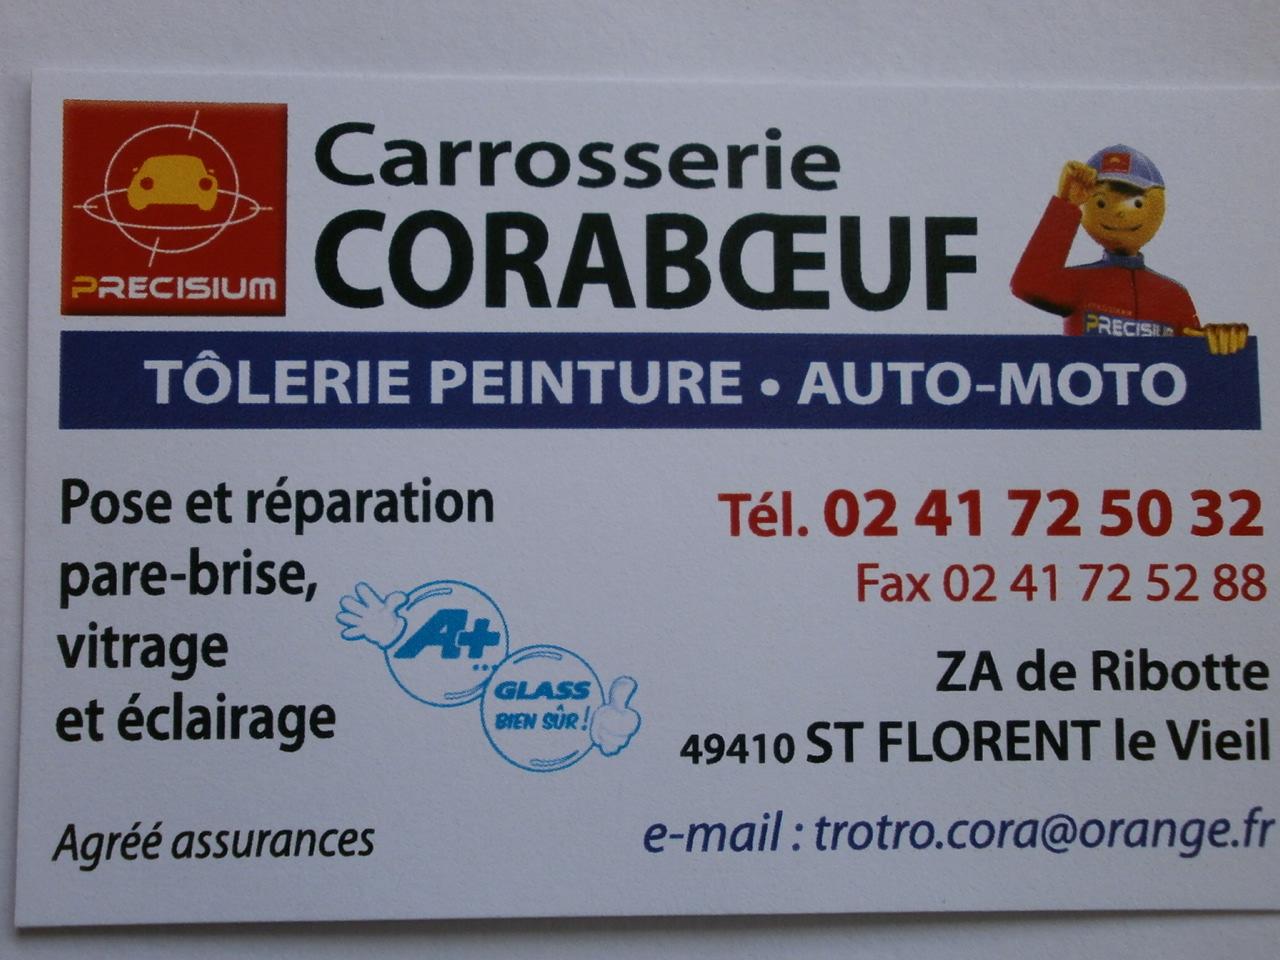 Carrosserie Coraboeuf